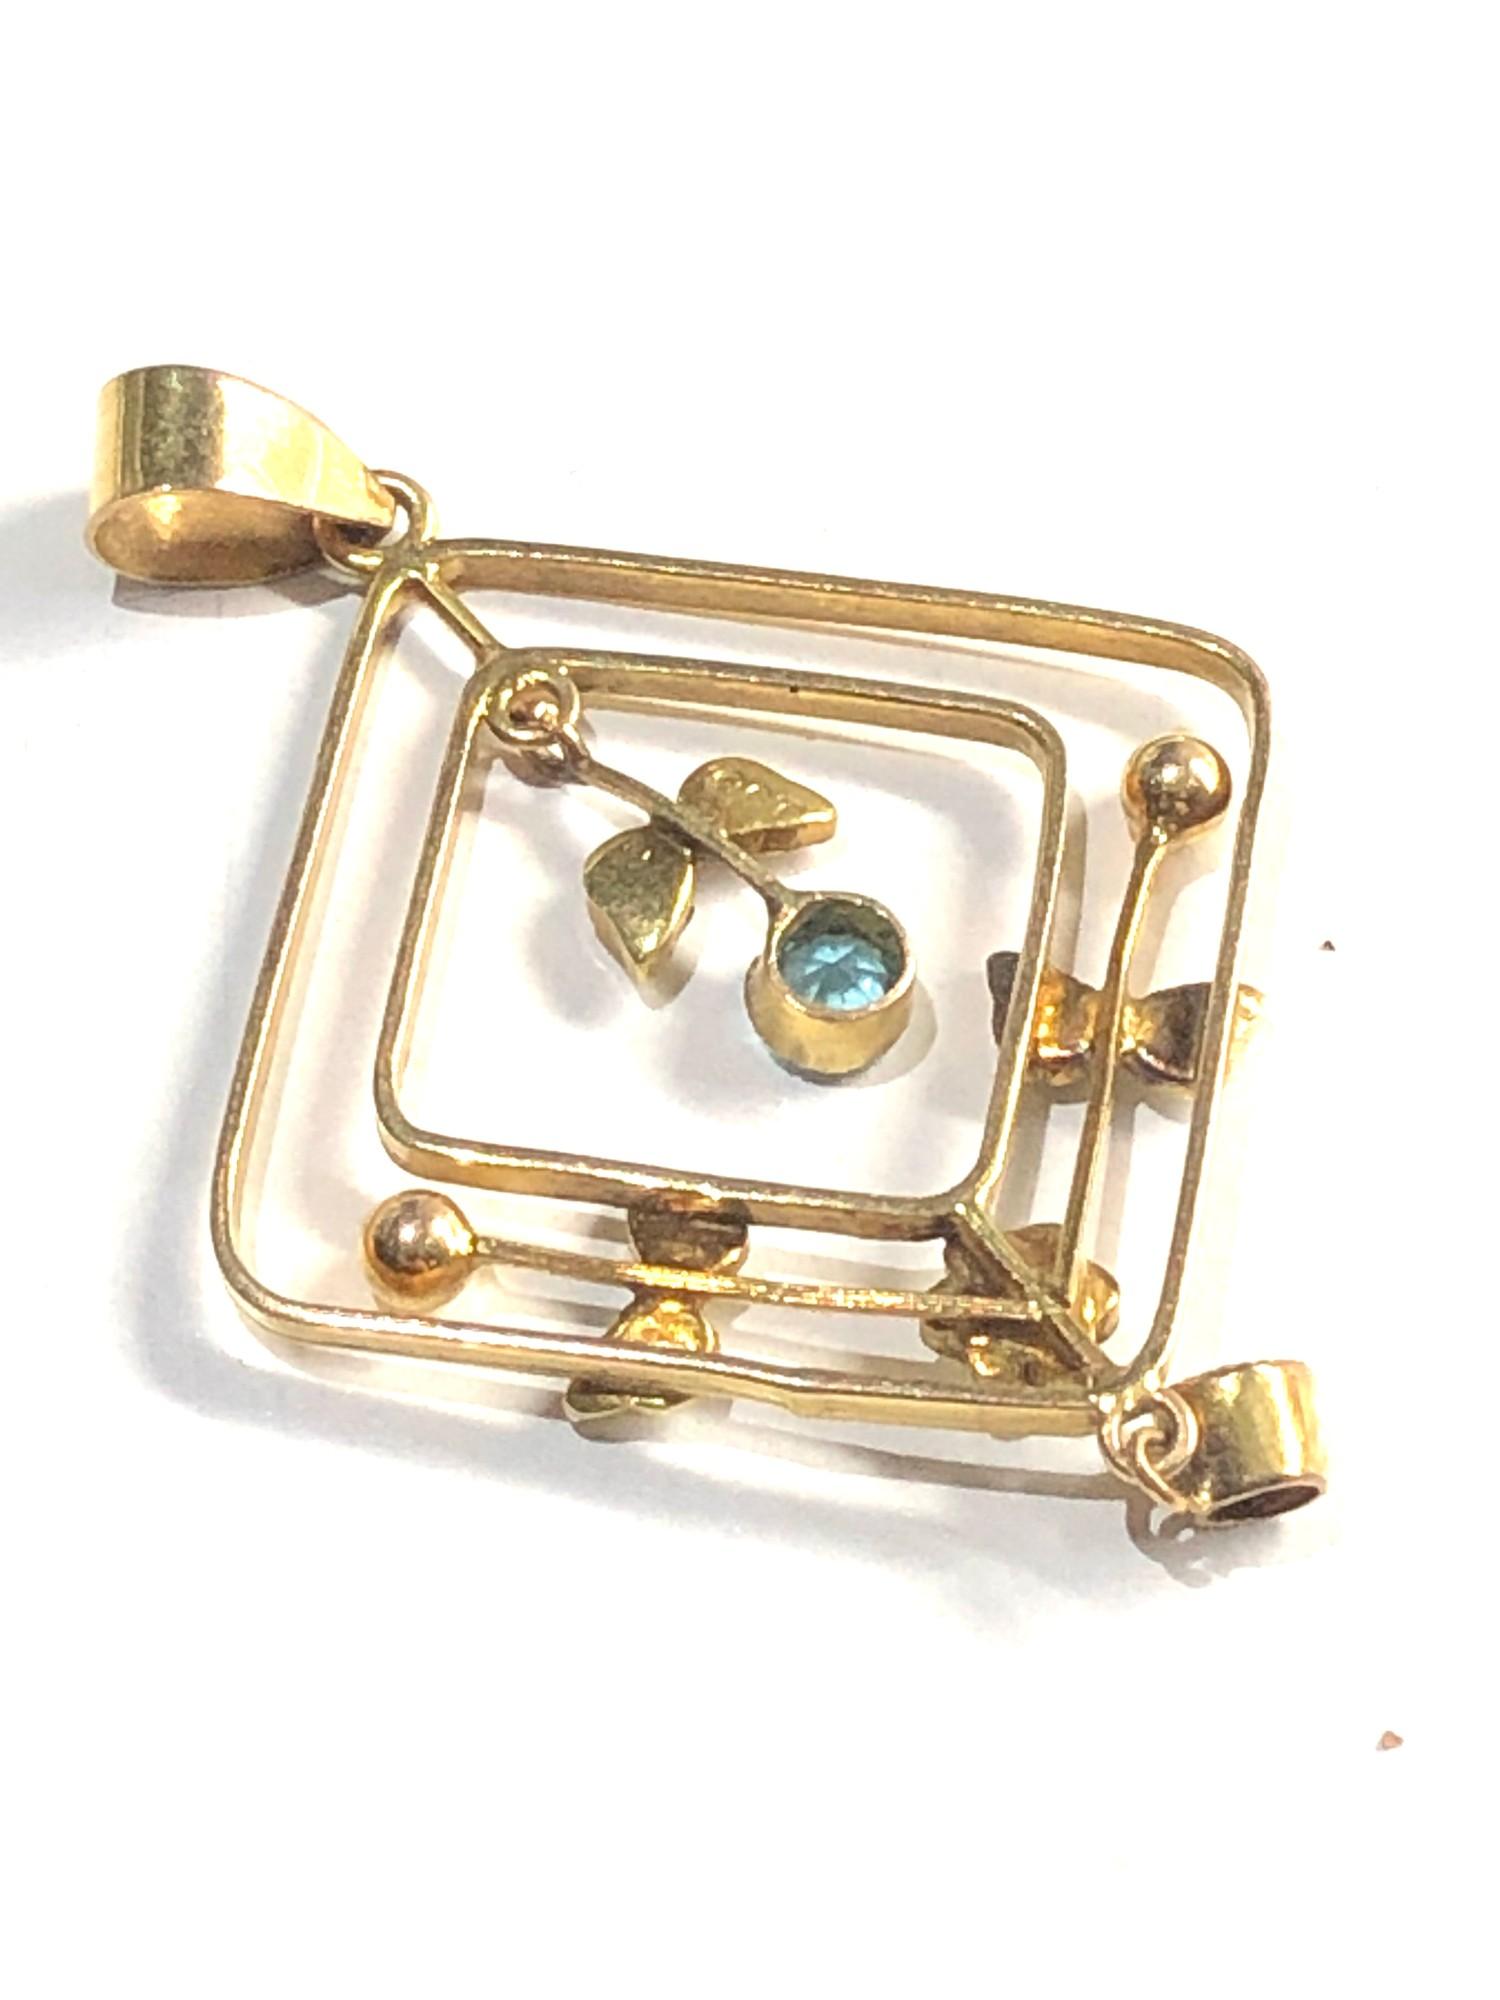 9ct gold antique pendant 2g - Image 2 of 2